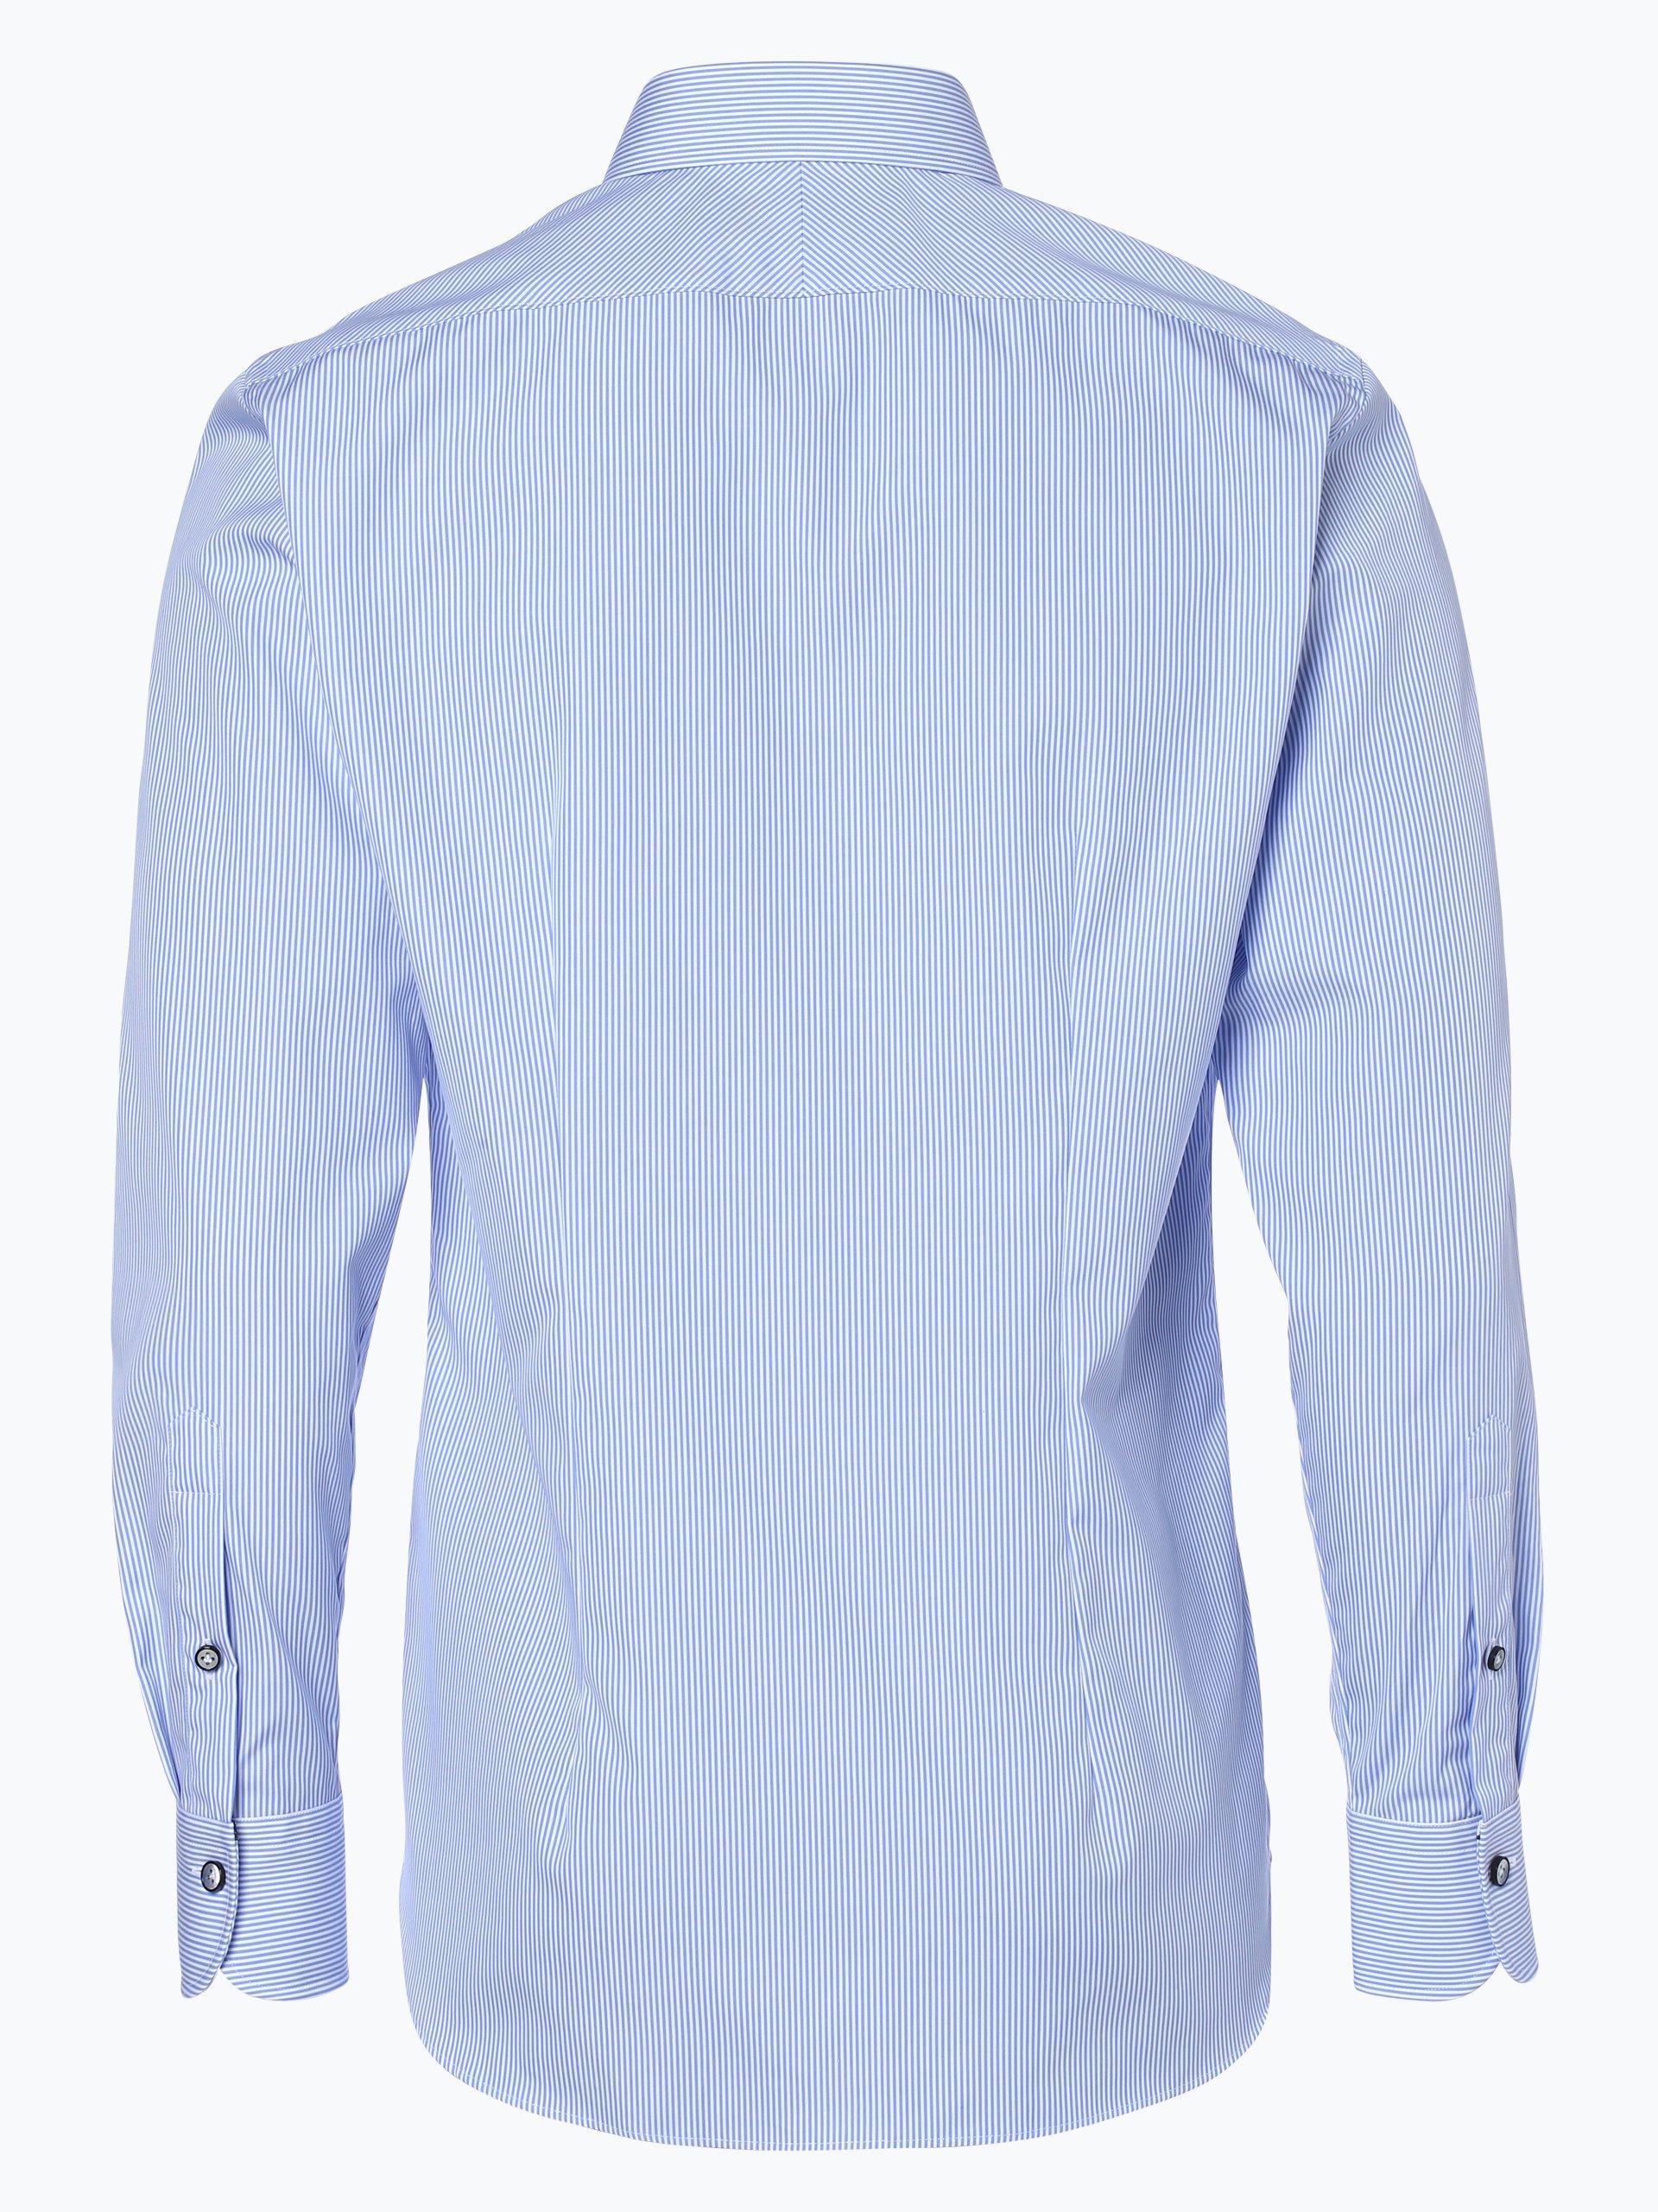 OLYMP SIGNATURE Koszula męska z tkaniny typu two ply